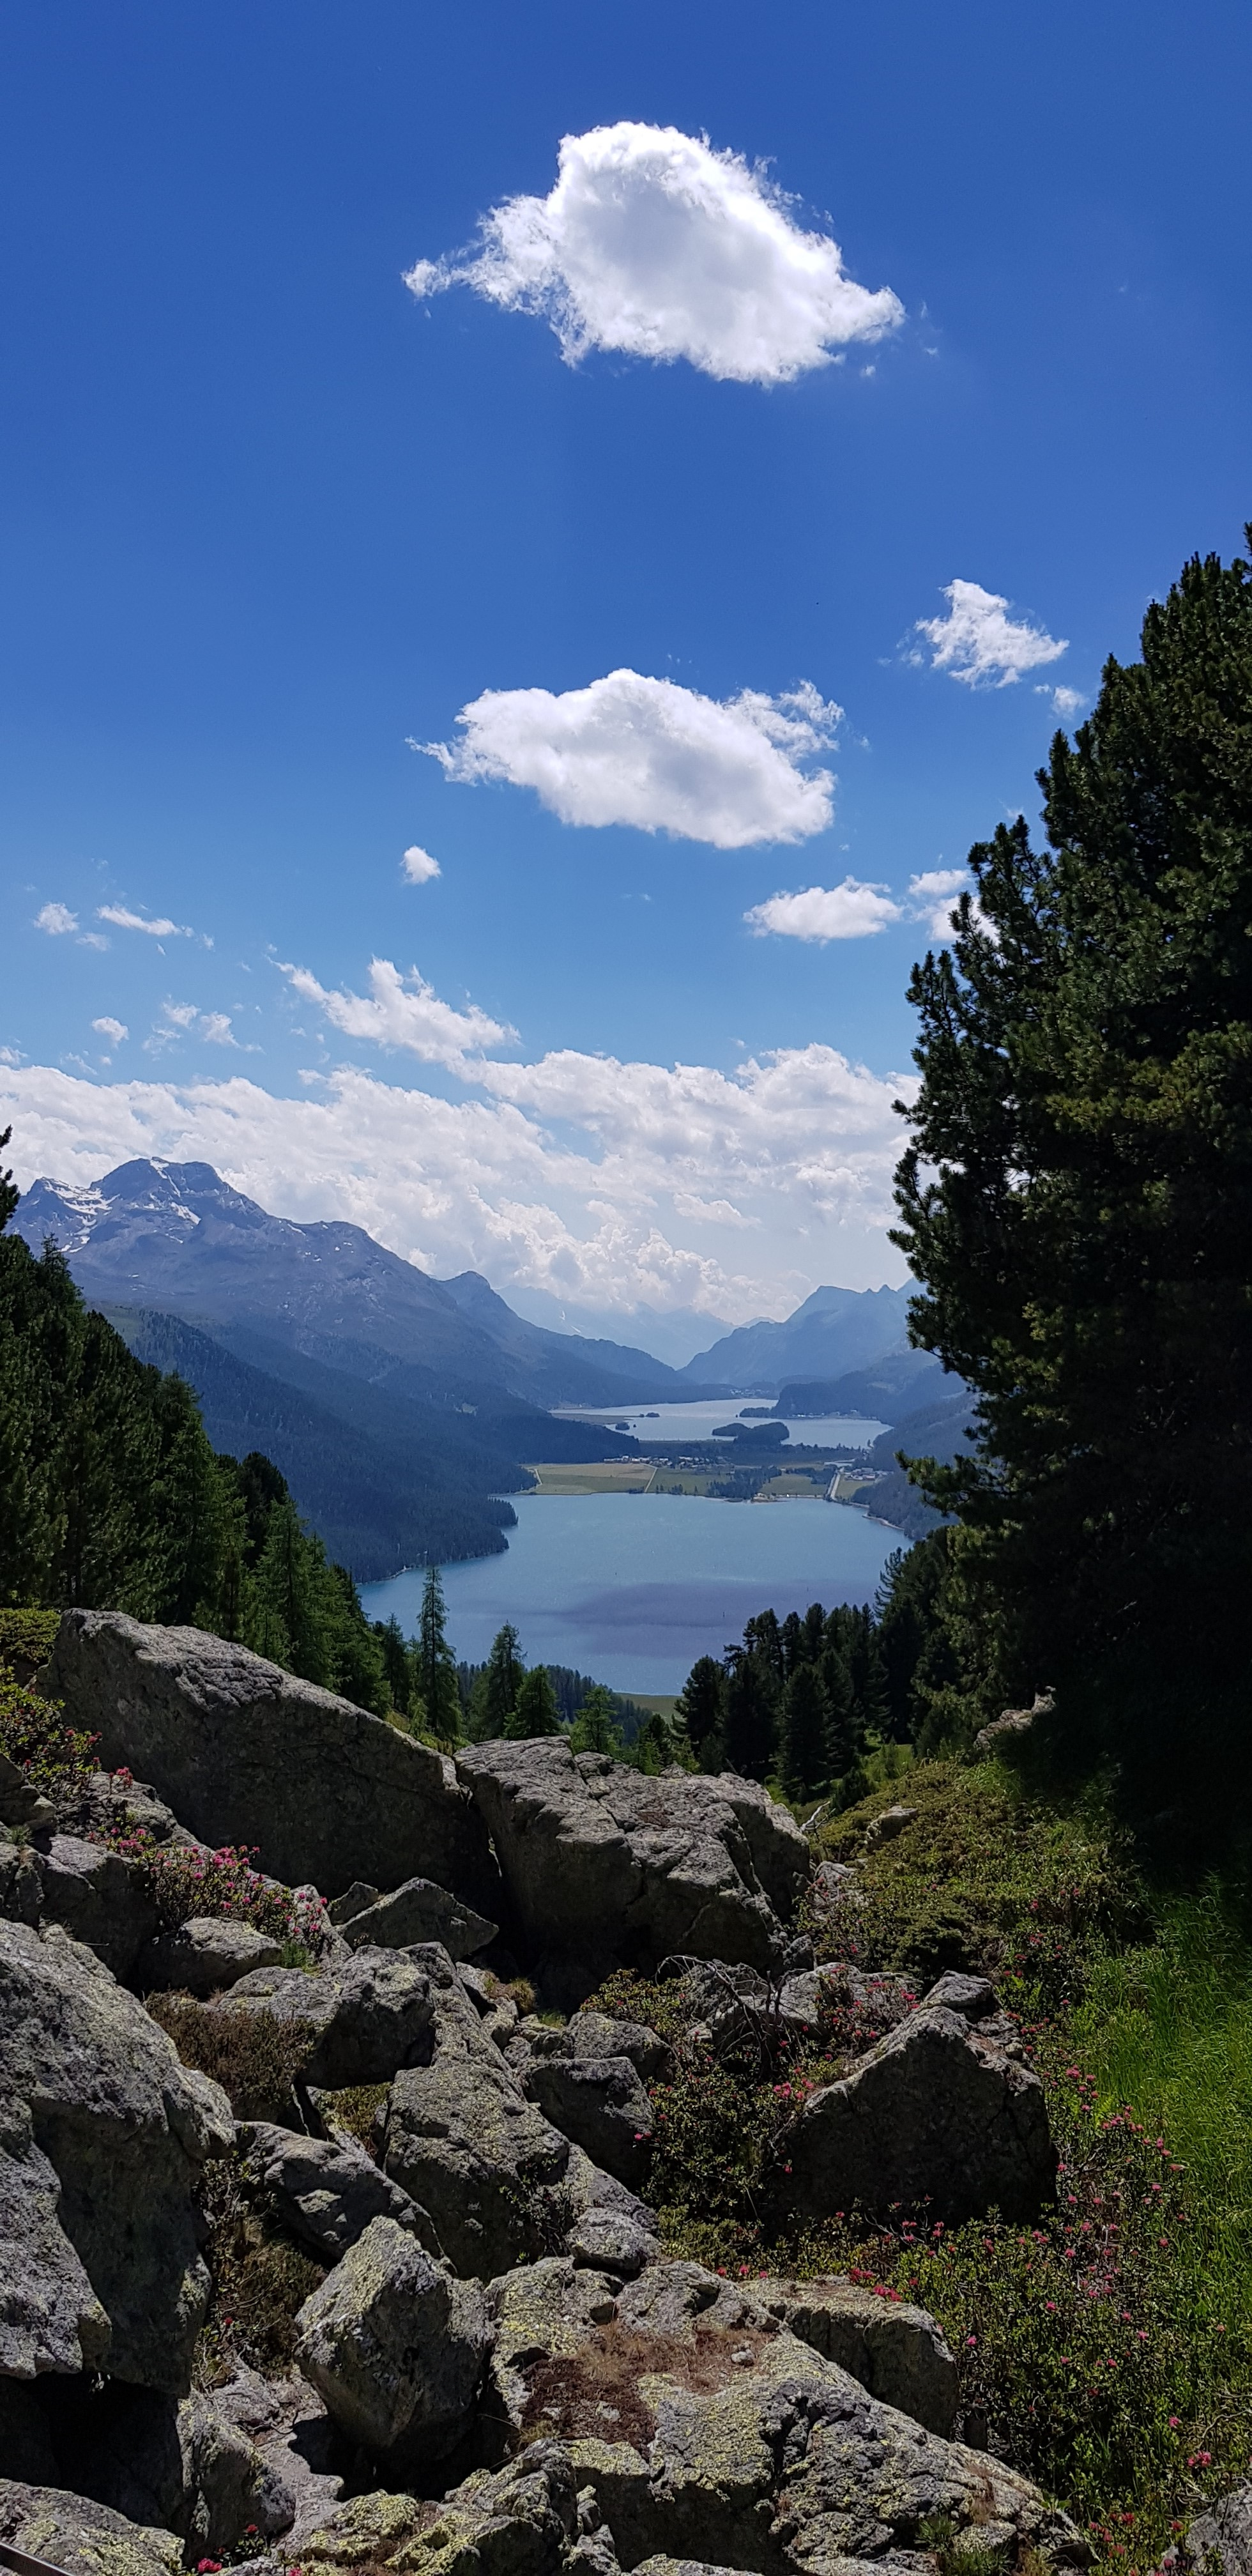 Engadine, St. Moritz, Crap Alv, view on Furtschellas, Lake Silvaplana, Lake Sils